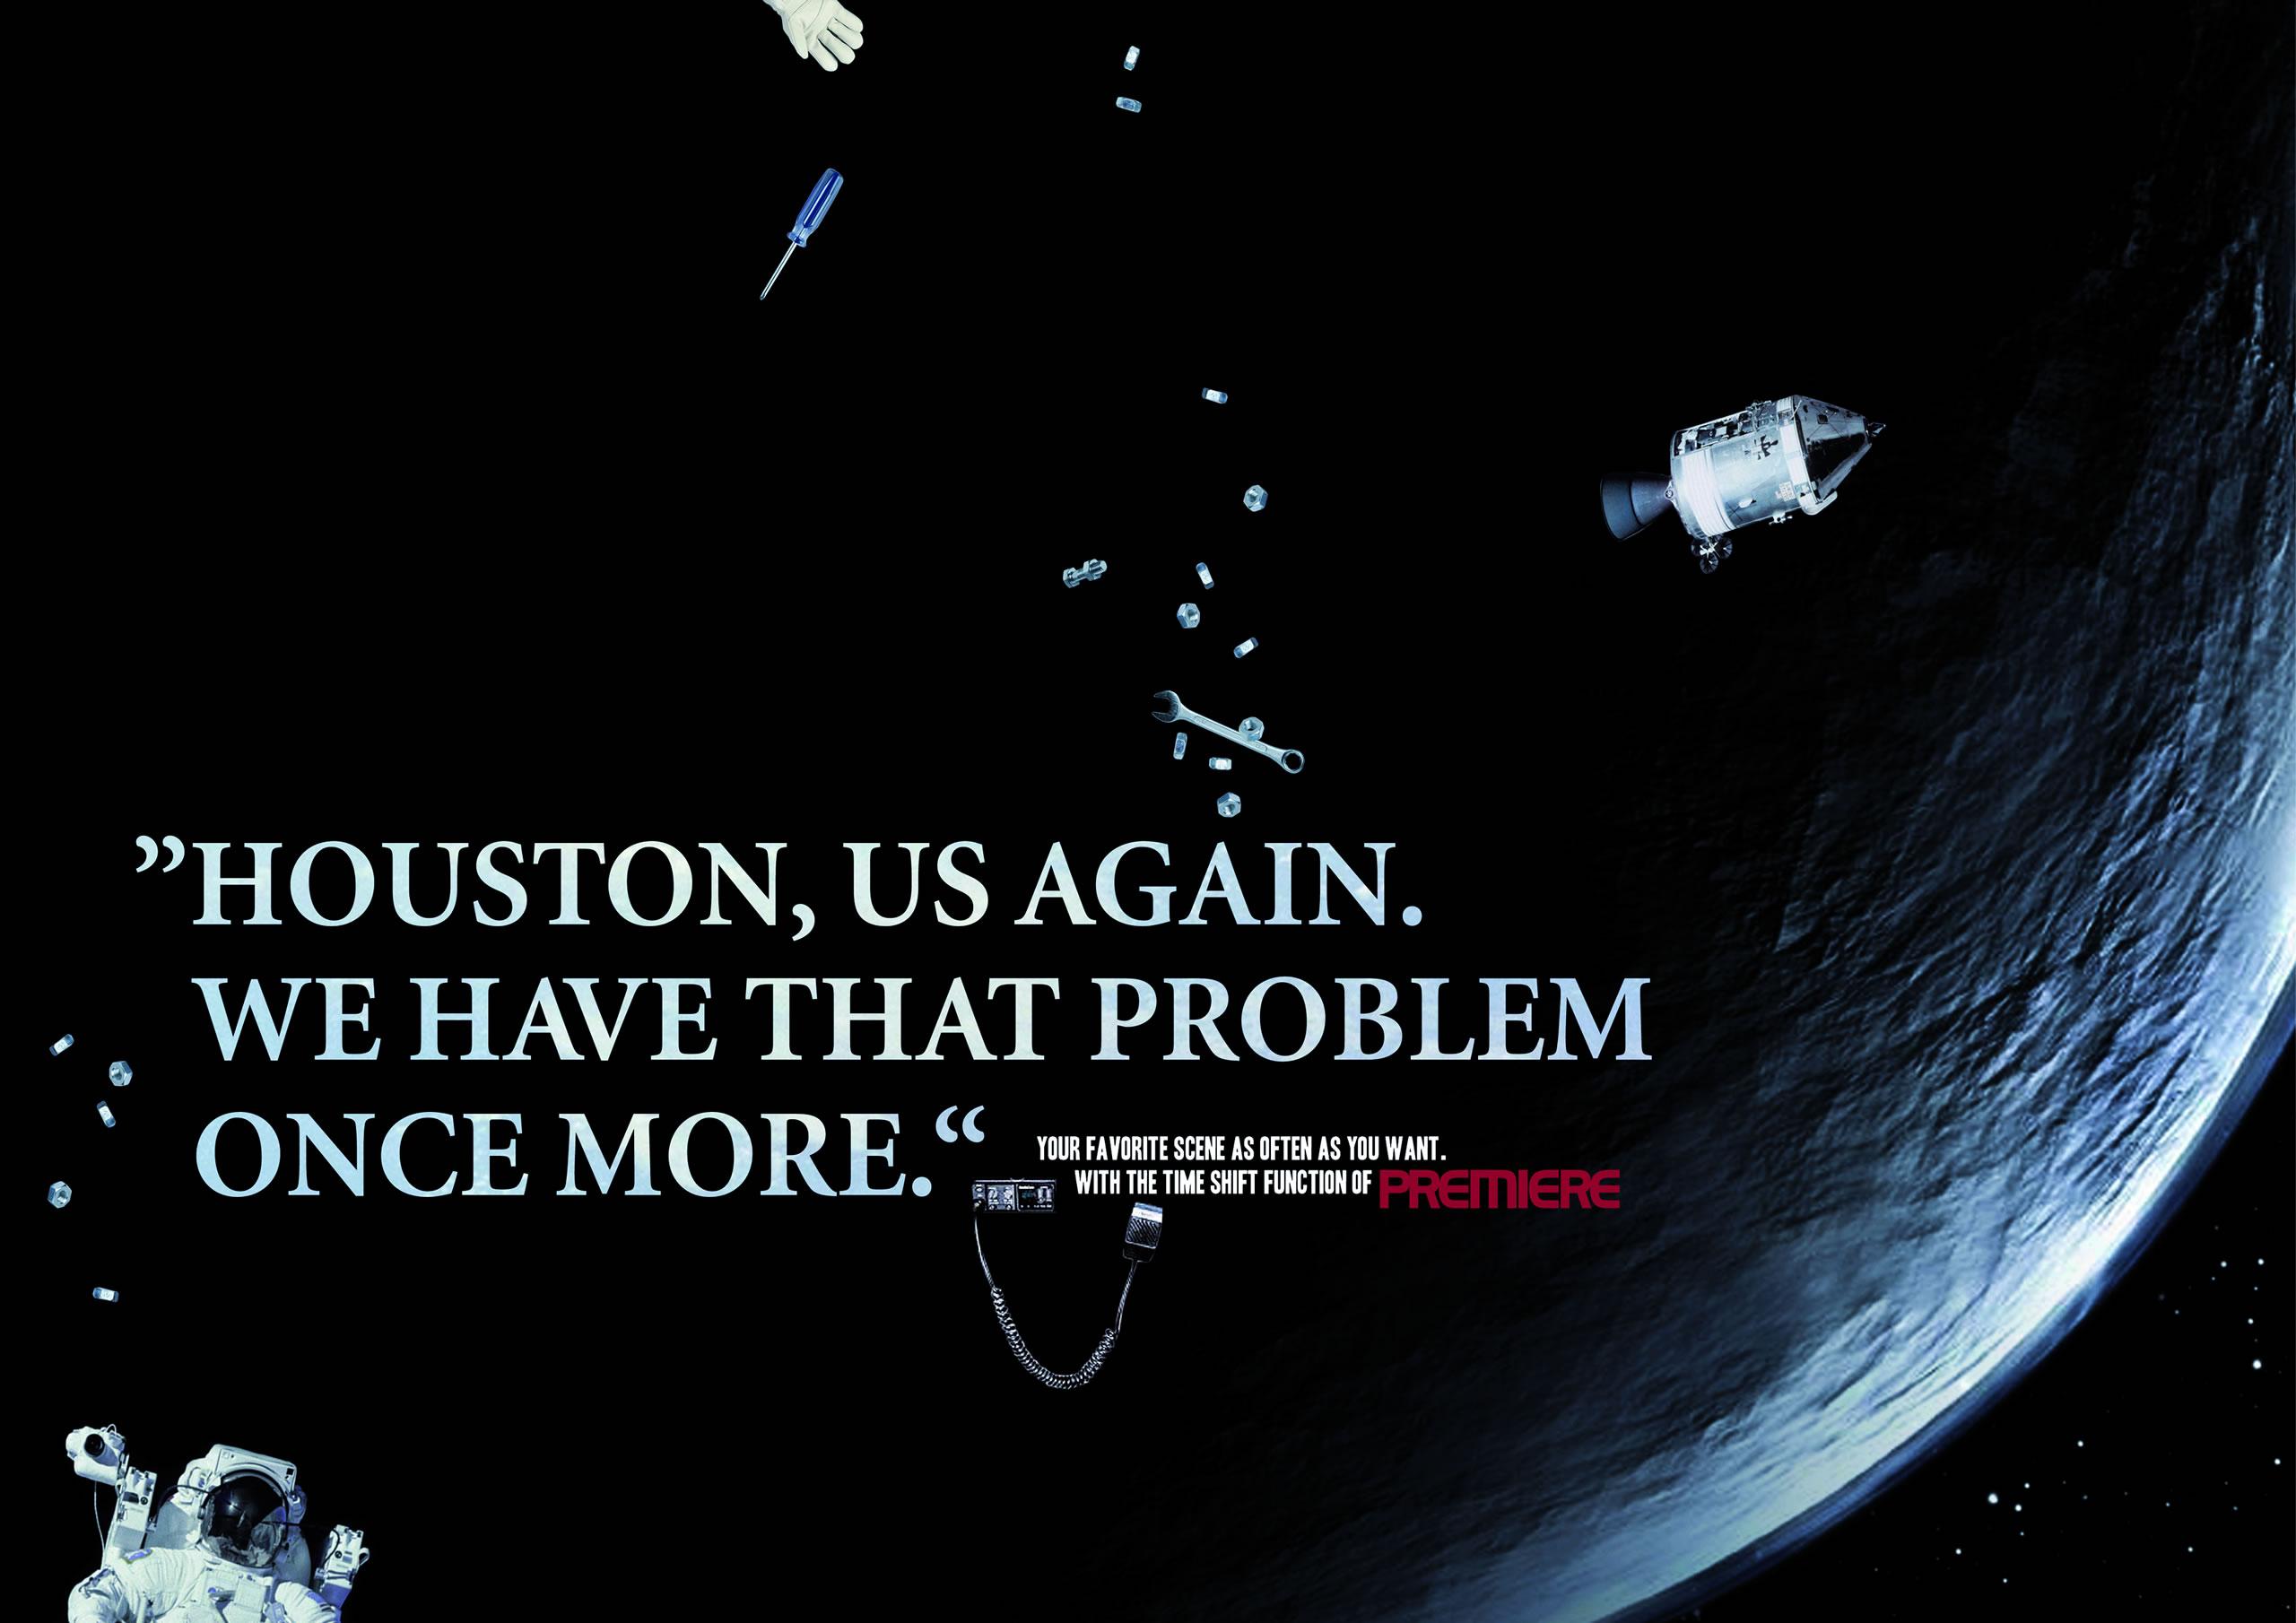 Apollo 13 Quotes Delightful quotes about apollo program (33 quotes)